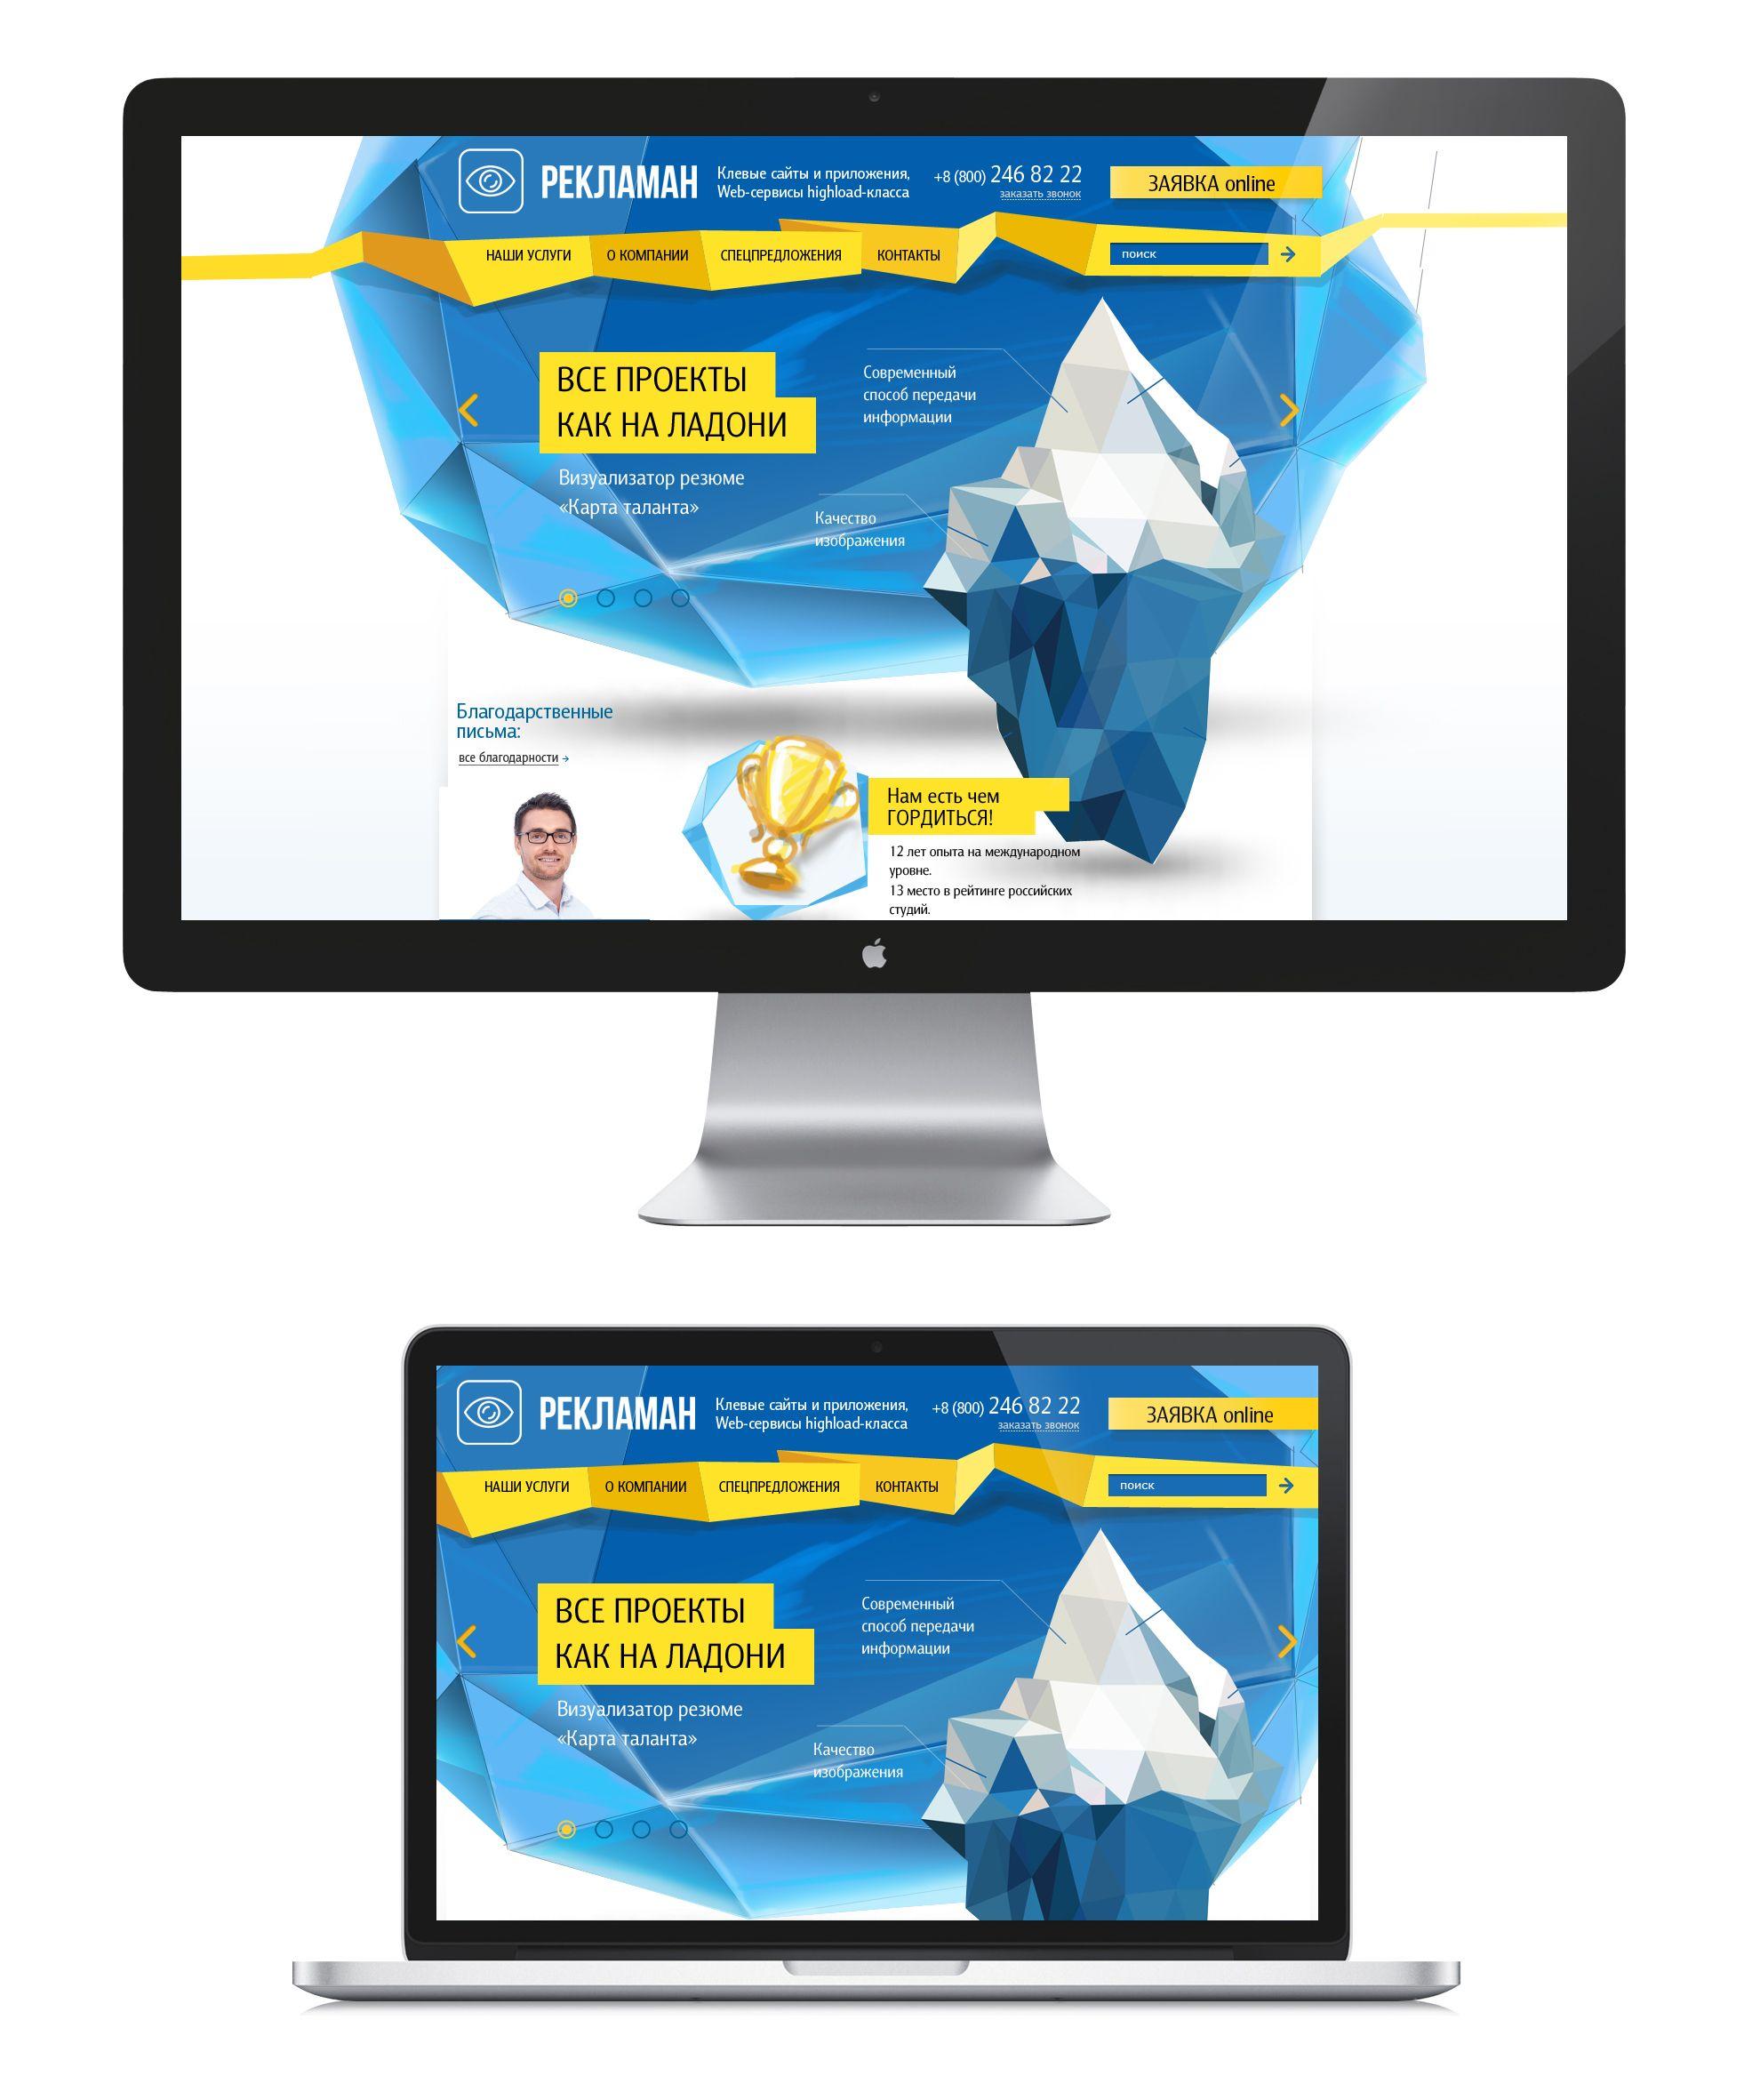 Дизайн сайта рекламного агентства - дизайнер IrinaKaoma